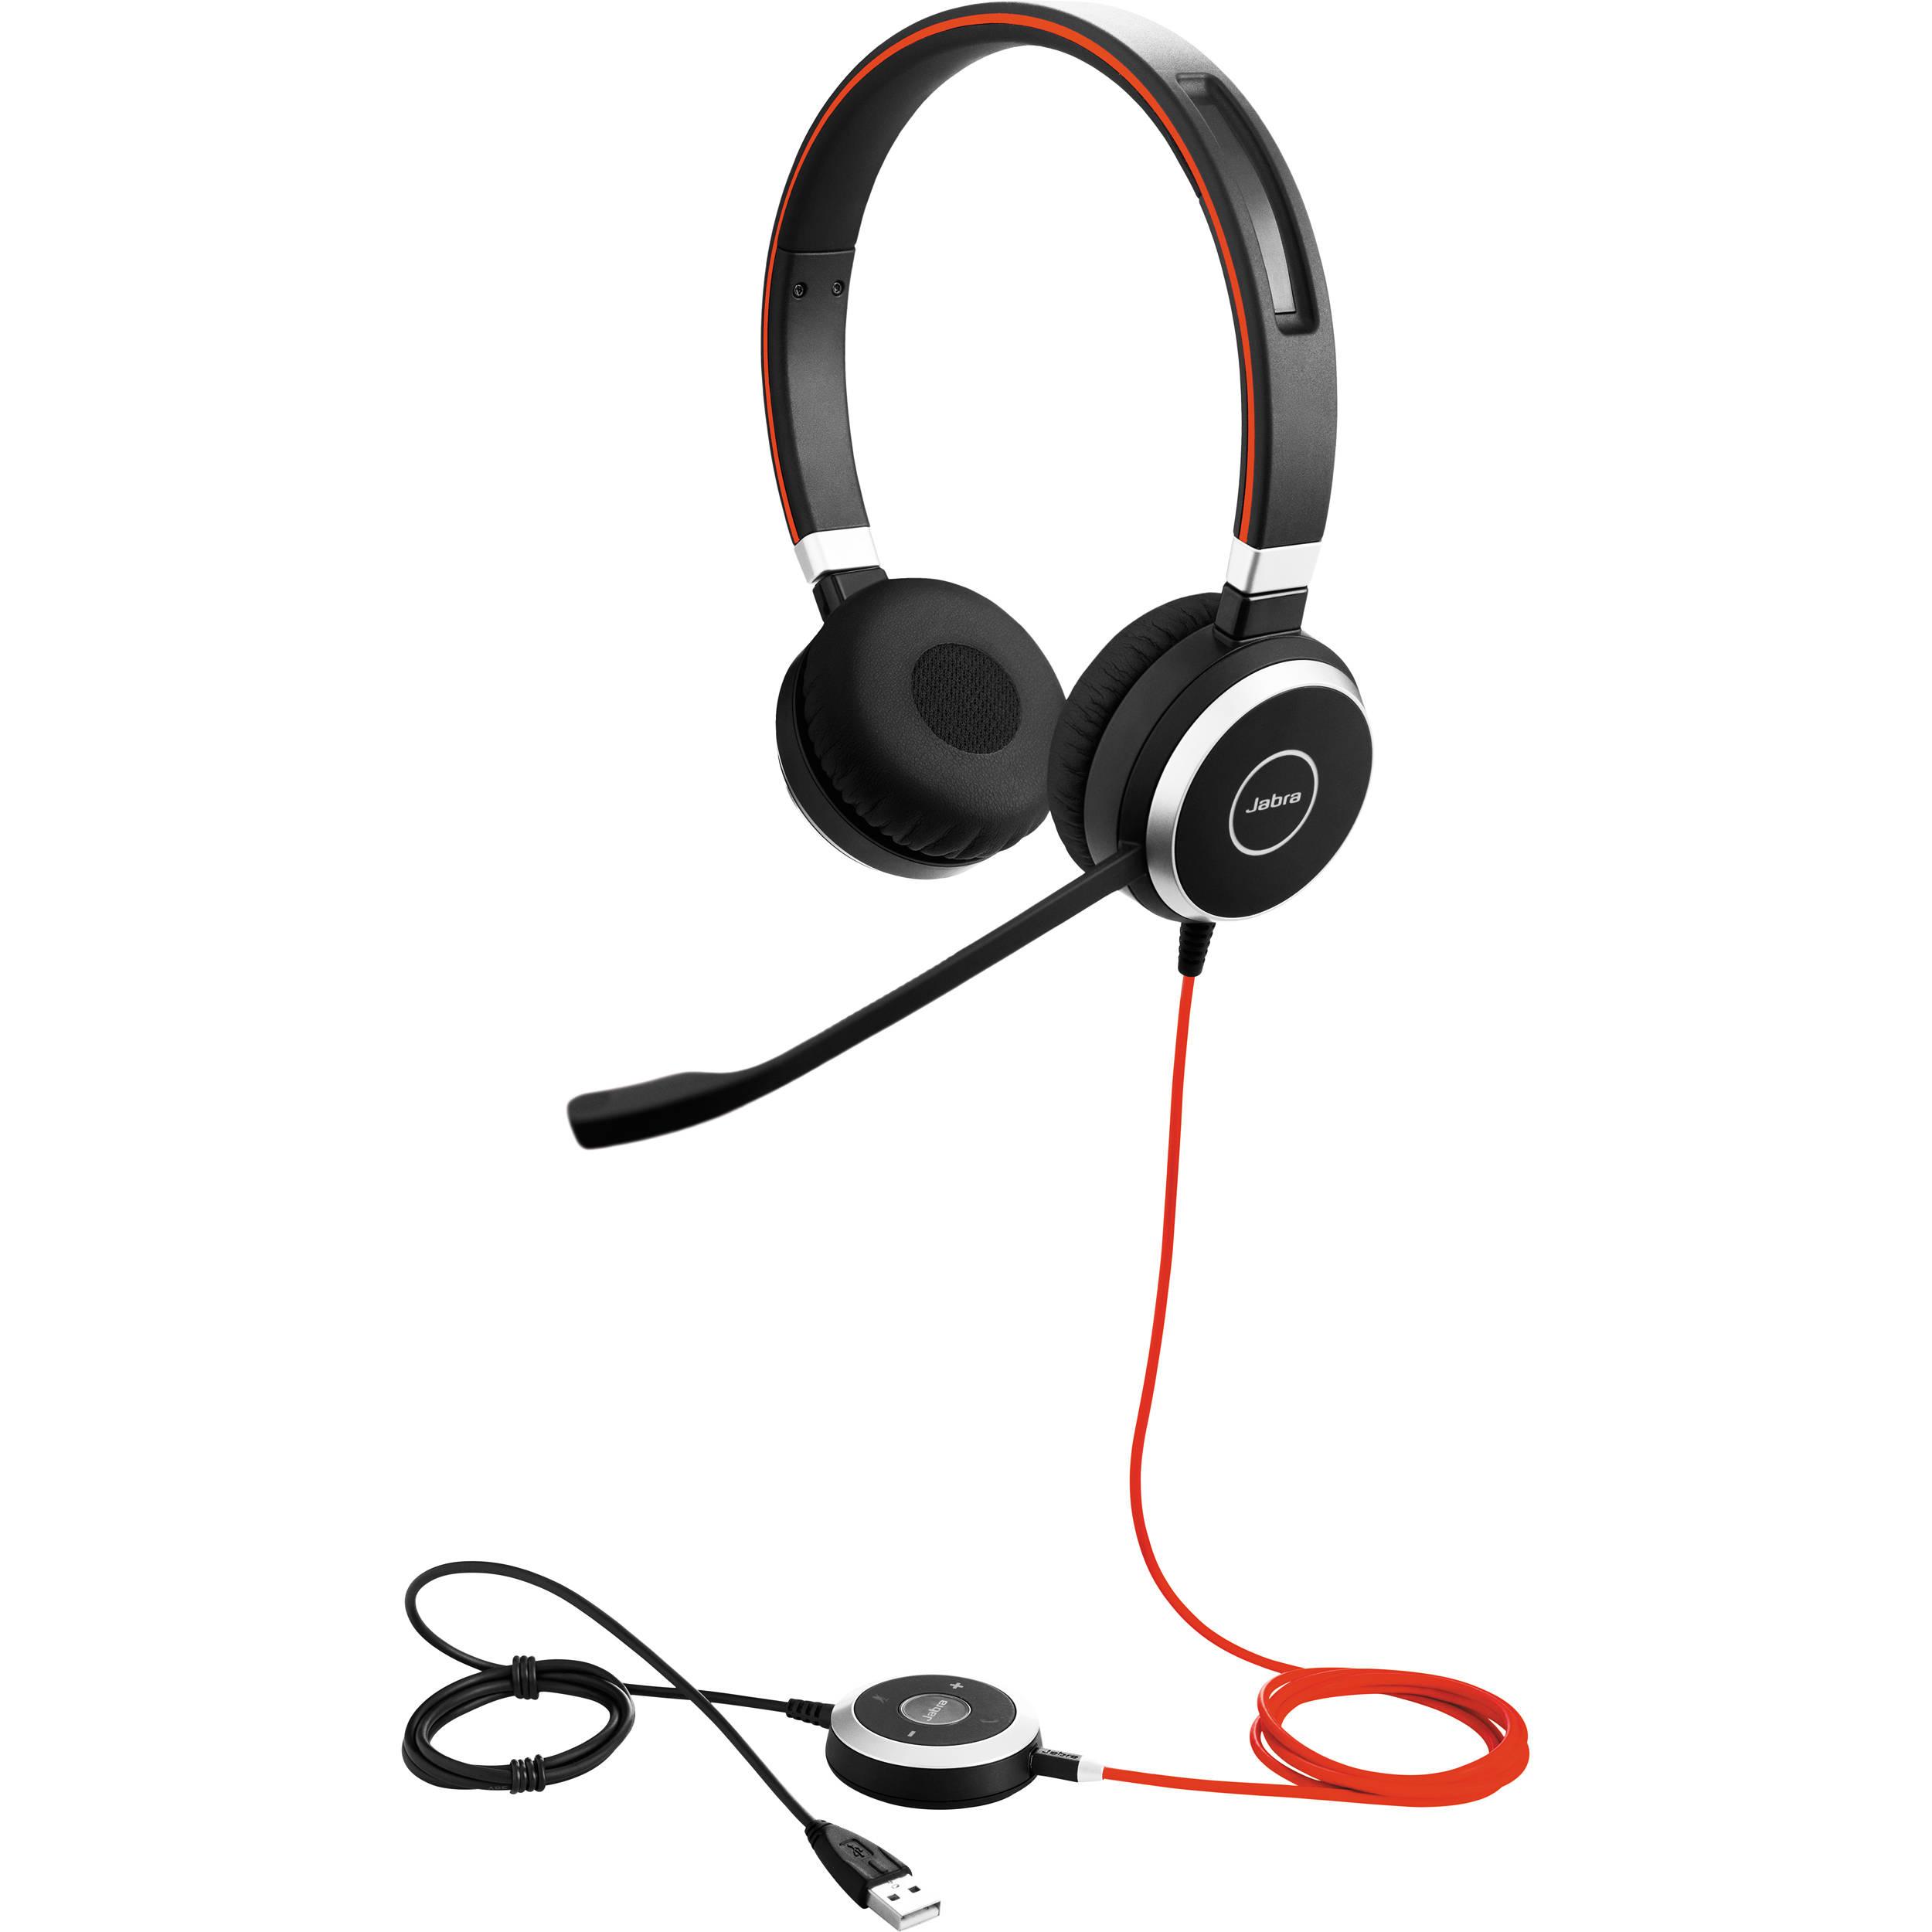 2cacb788af2 Jabra EVOLVE 40 UC Stereo Headset 6399-829-209 B&H Photo Video